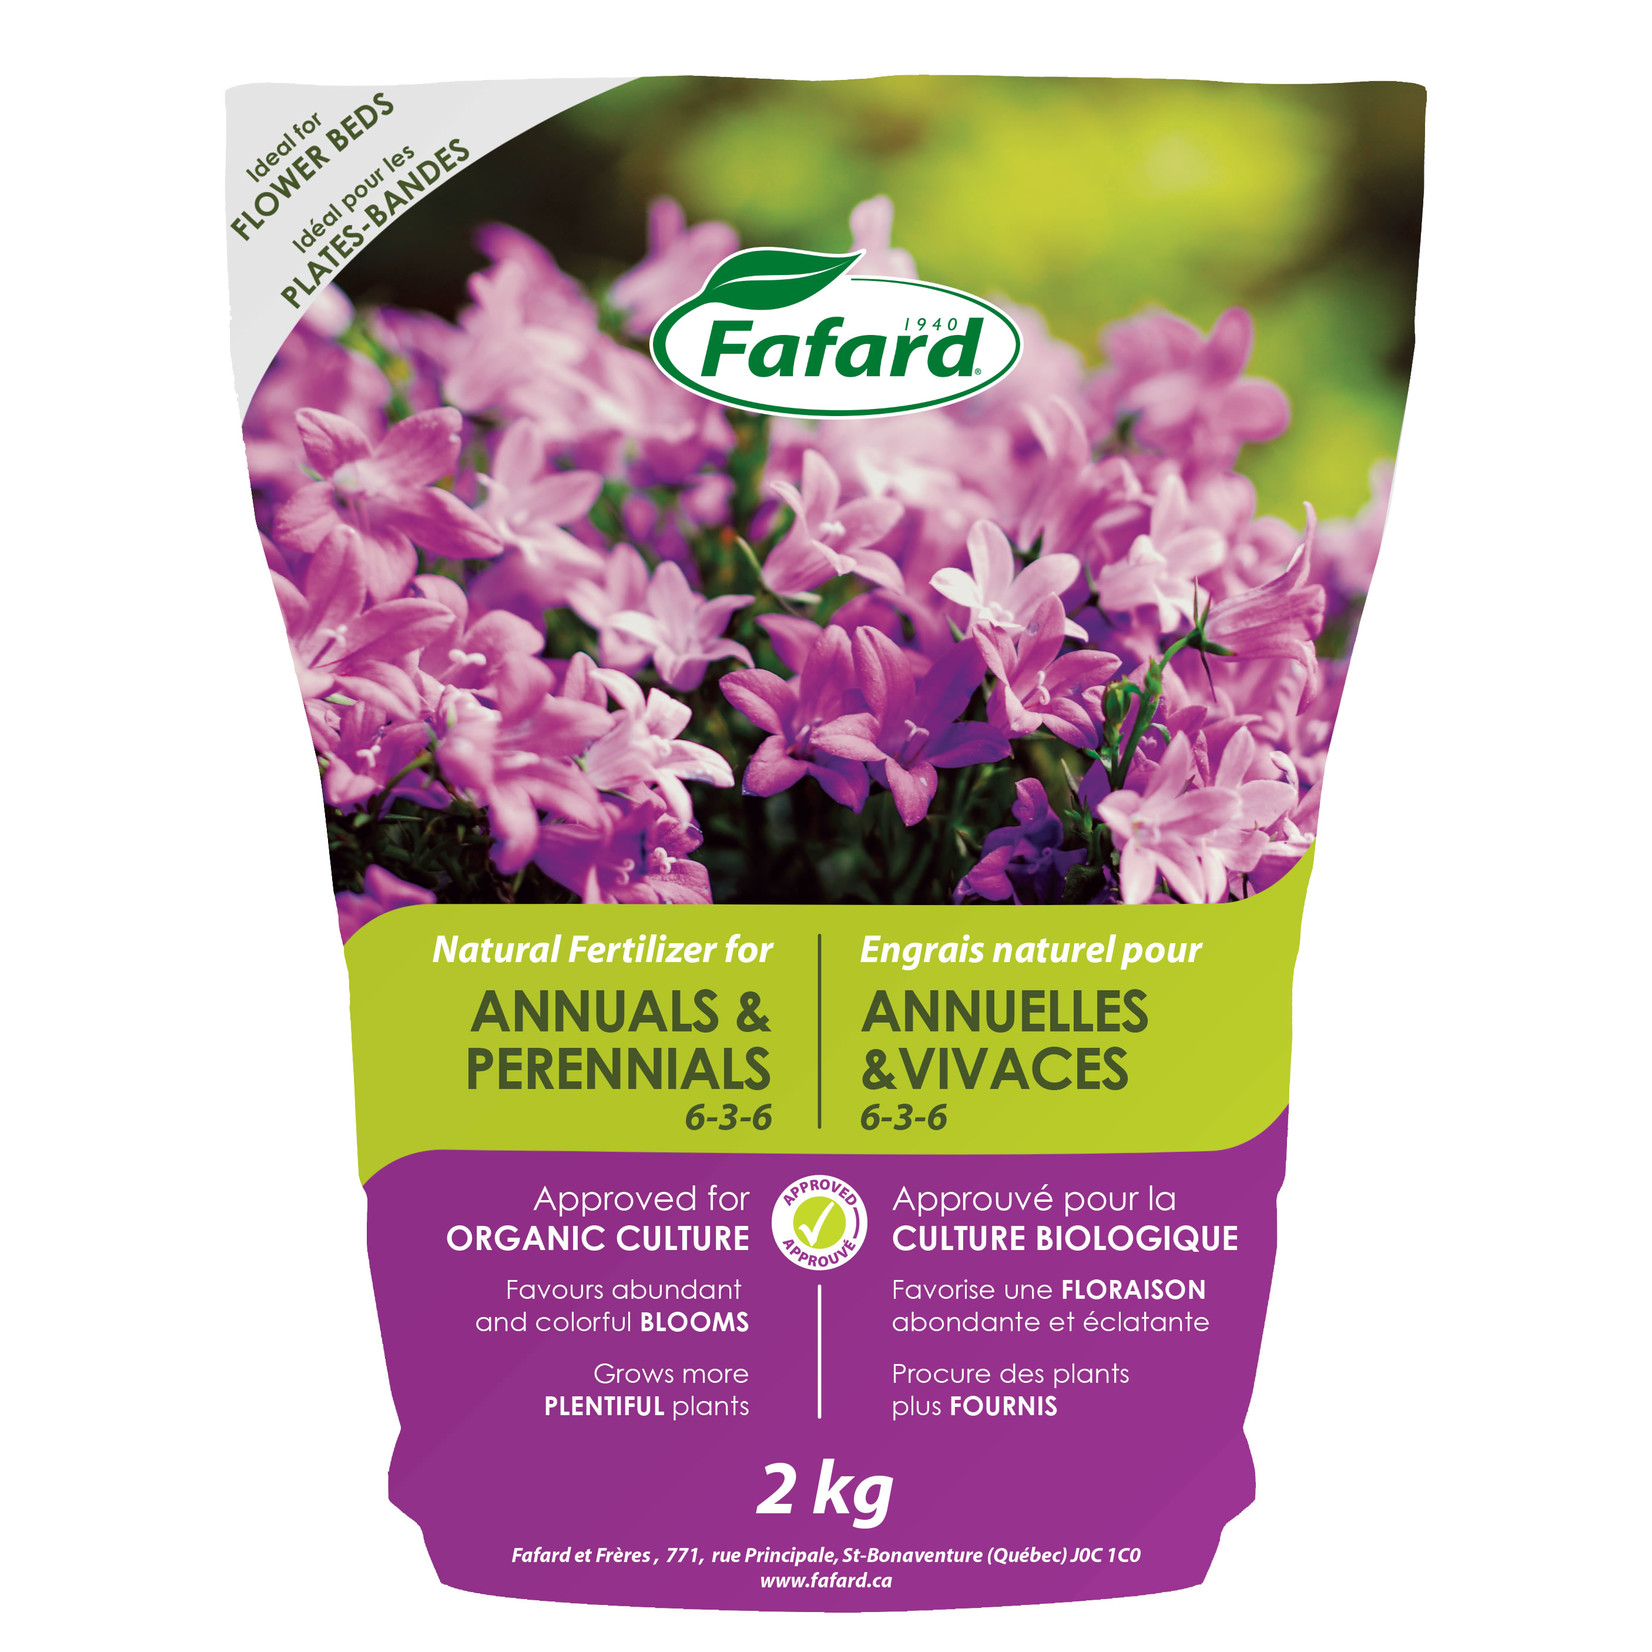 Fafard Natural Fertilizer for Annuals & Perennials 2kg